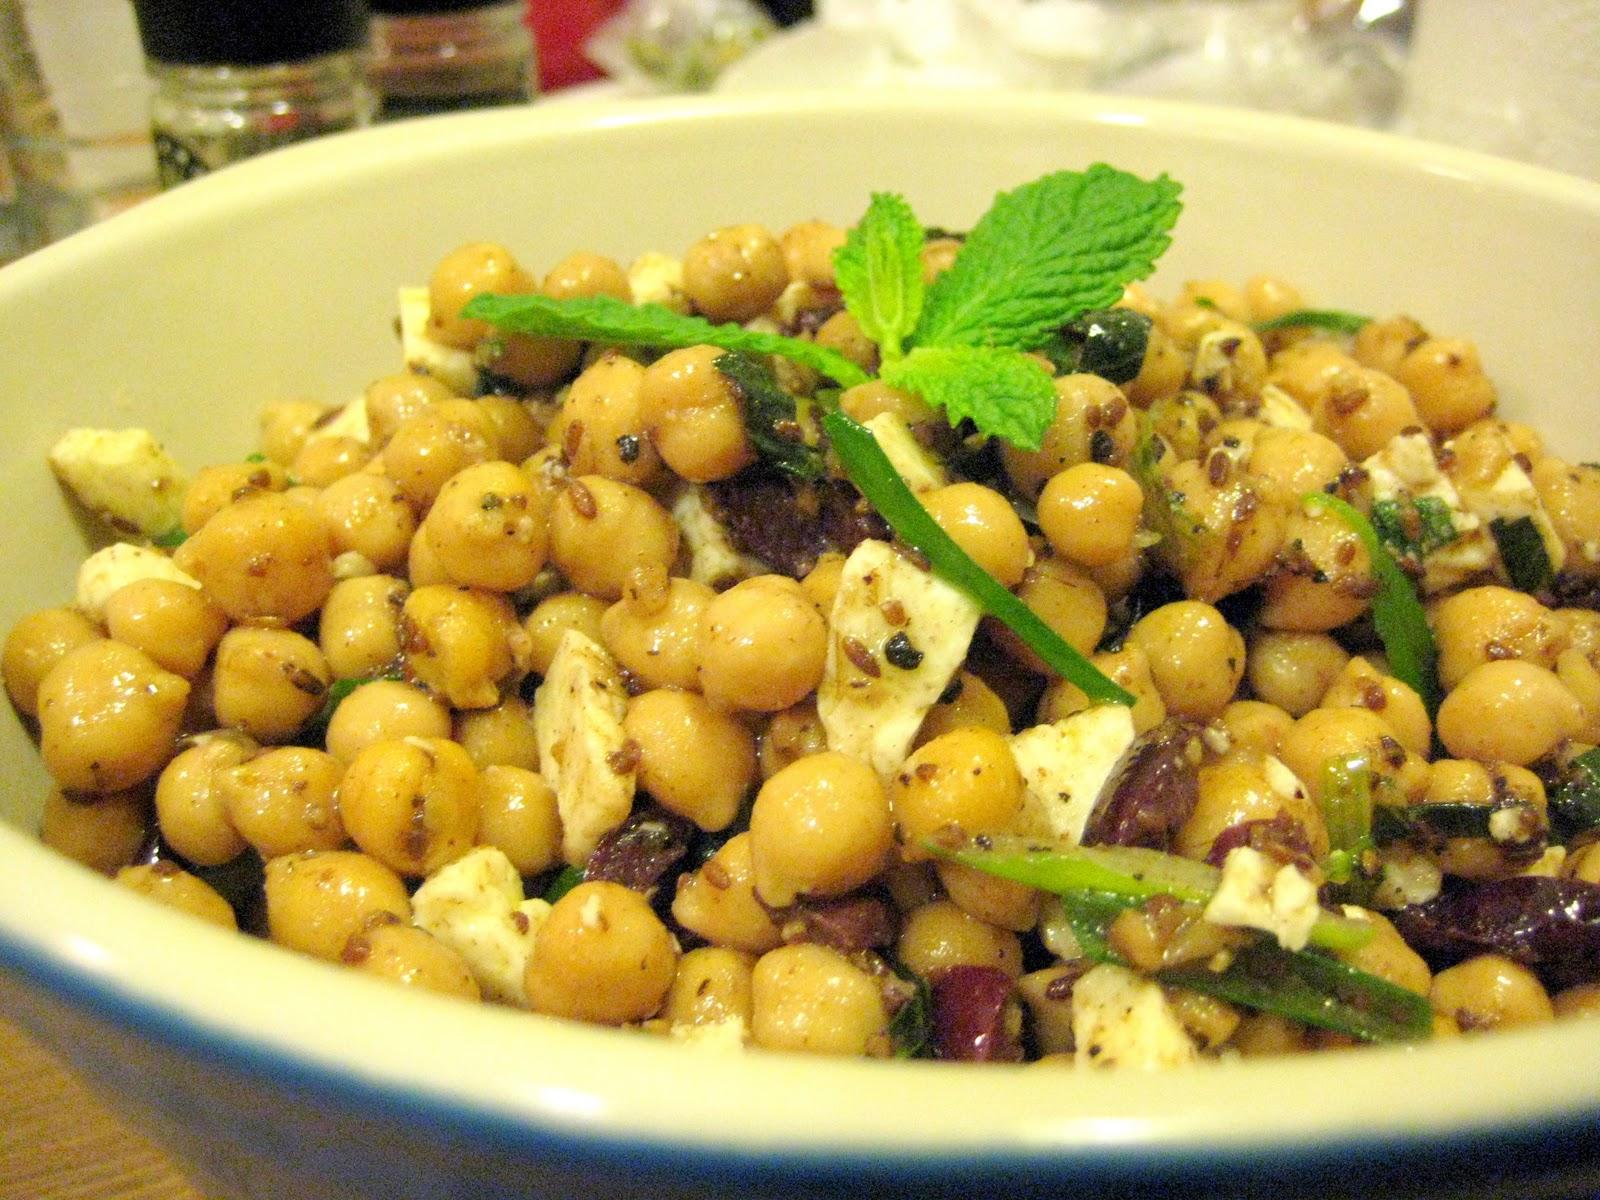 Test Kitchen: Test: Chickpea Salad with Cumin Vinaigrette